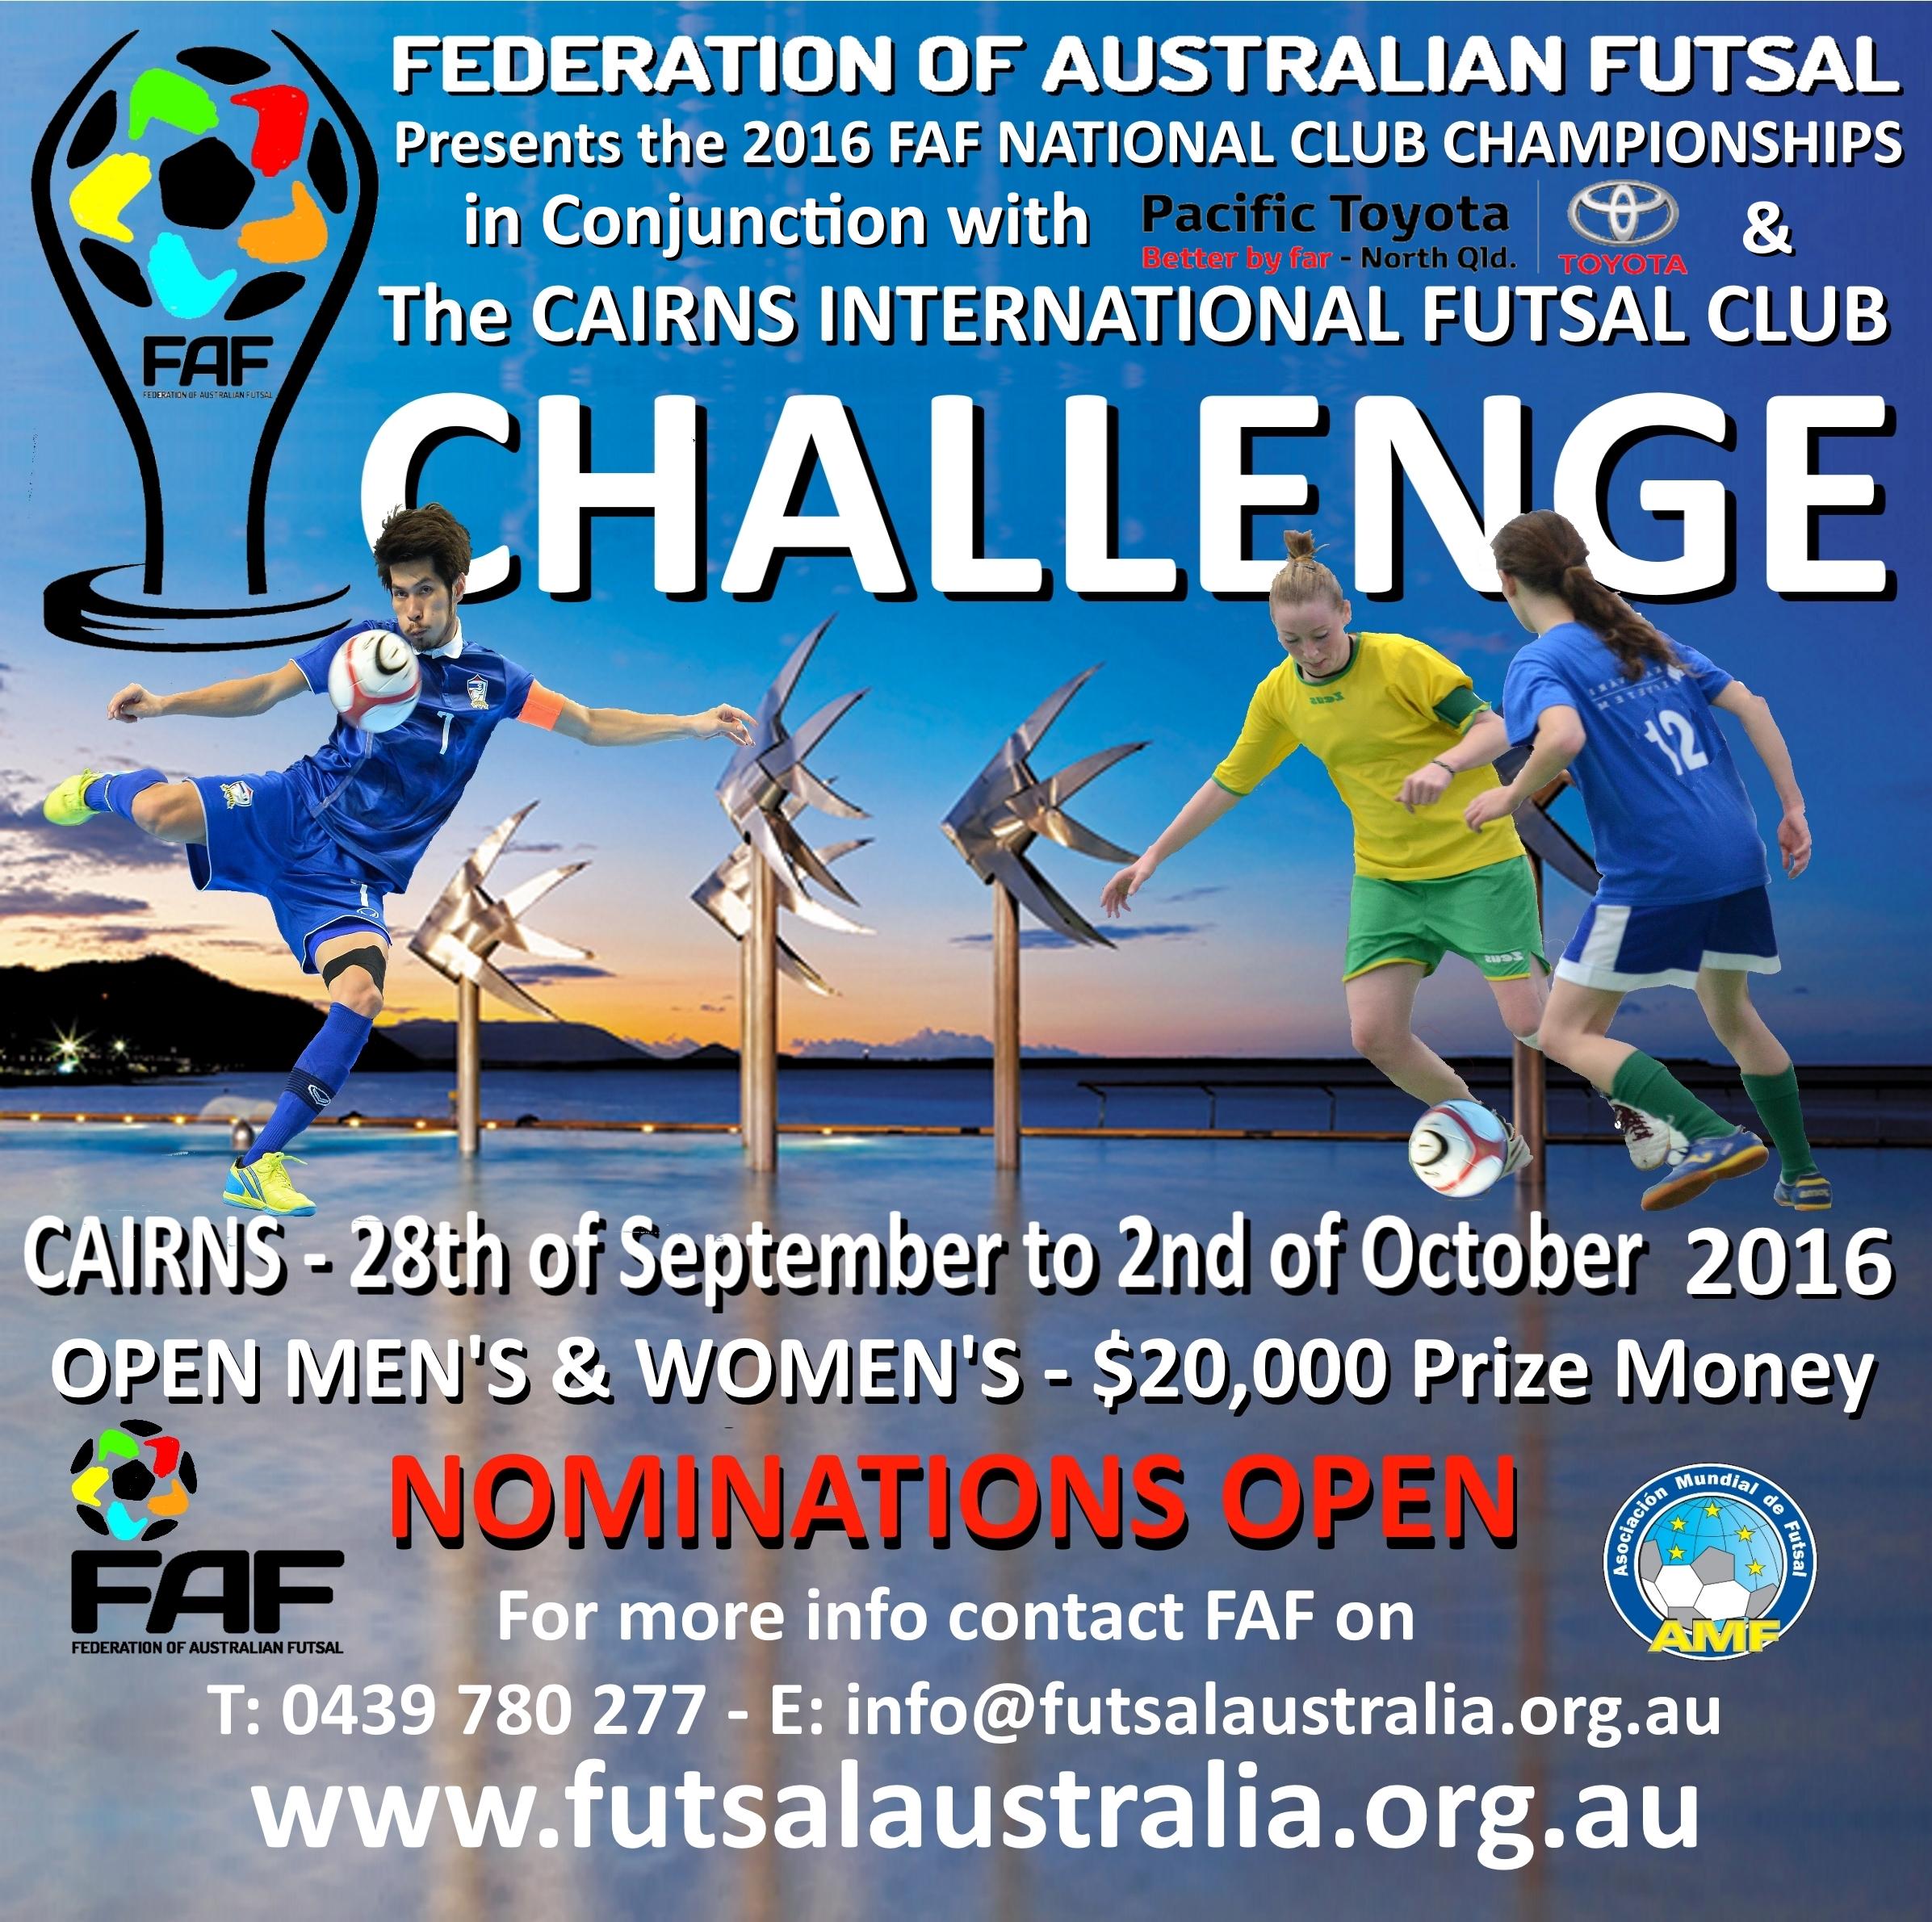 ab92acf3b FAF ANNOUNCES THE NATIONAL FUTSAL CLUB CHAMPIONSHIPS (Men s   Women s)